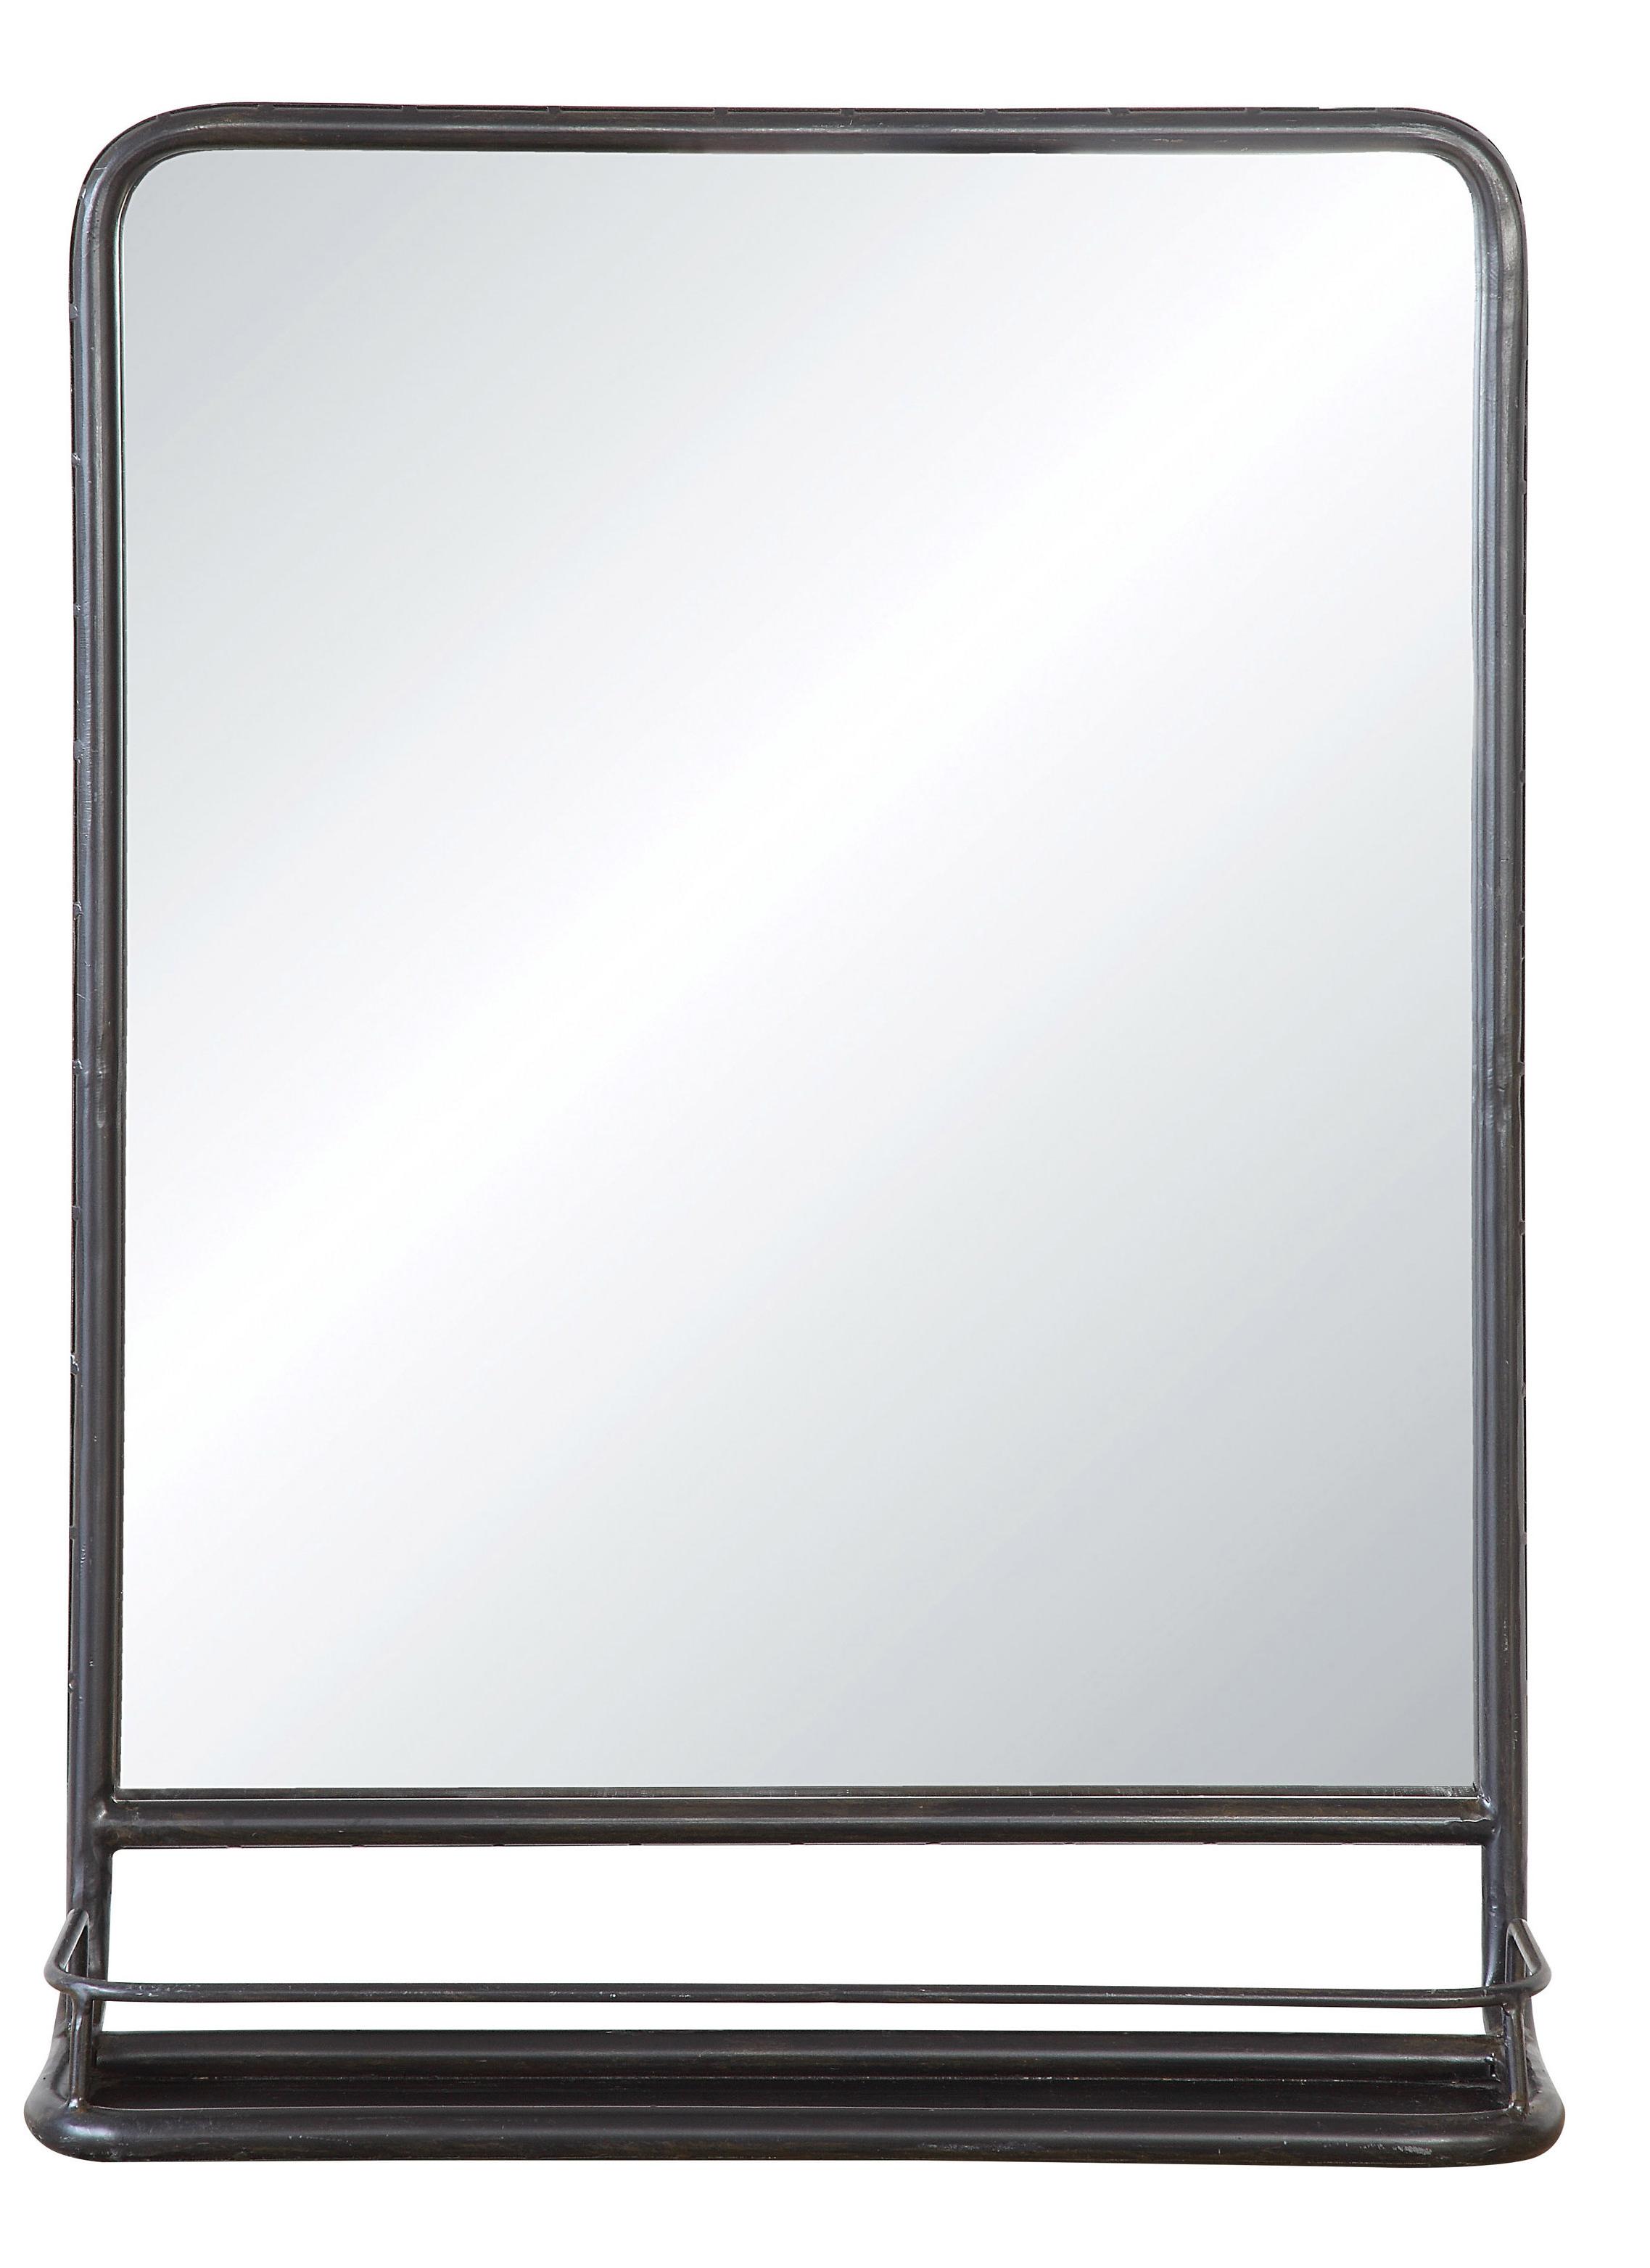 Peetz Modern Rustic Accent Mirror Pertaining To Famous Peetz Modern Rustic Accent Mirrors (View 2 of 20)